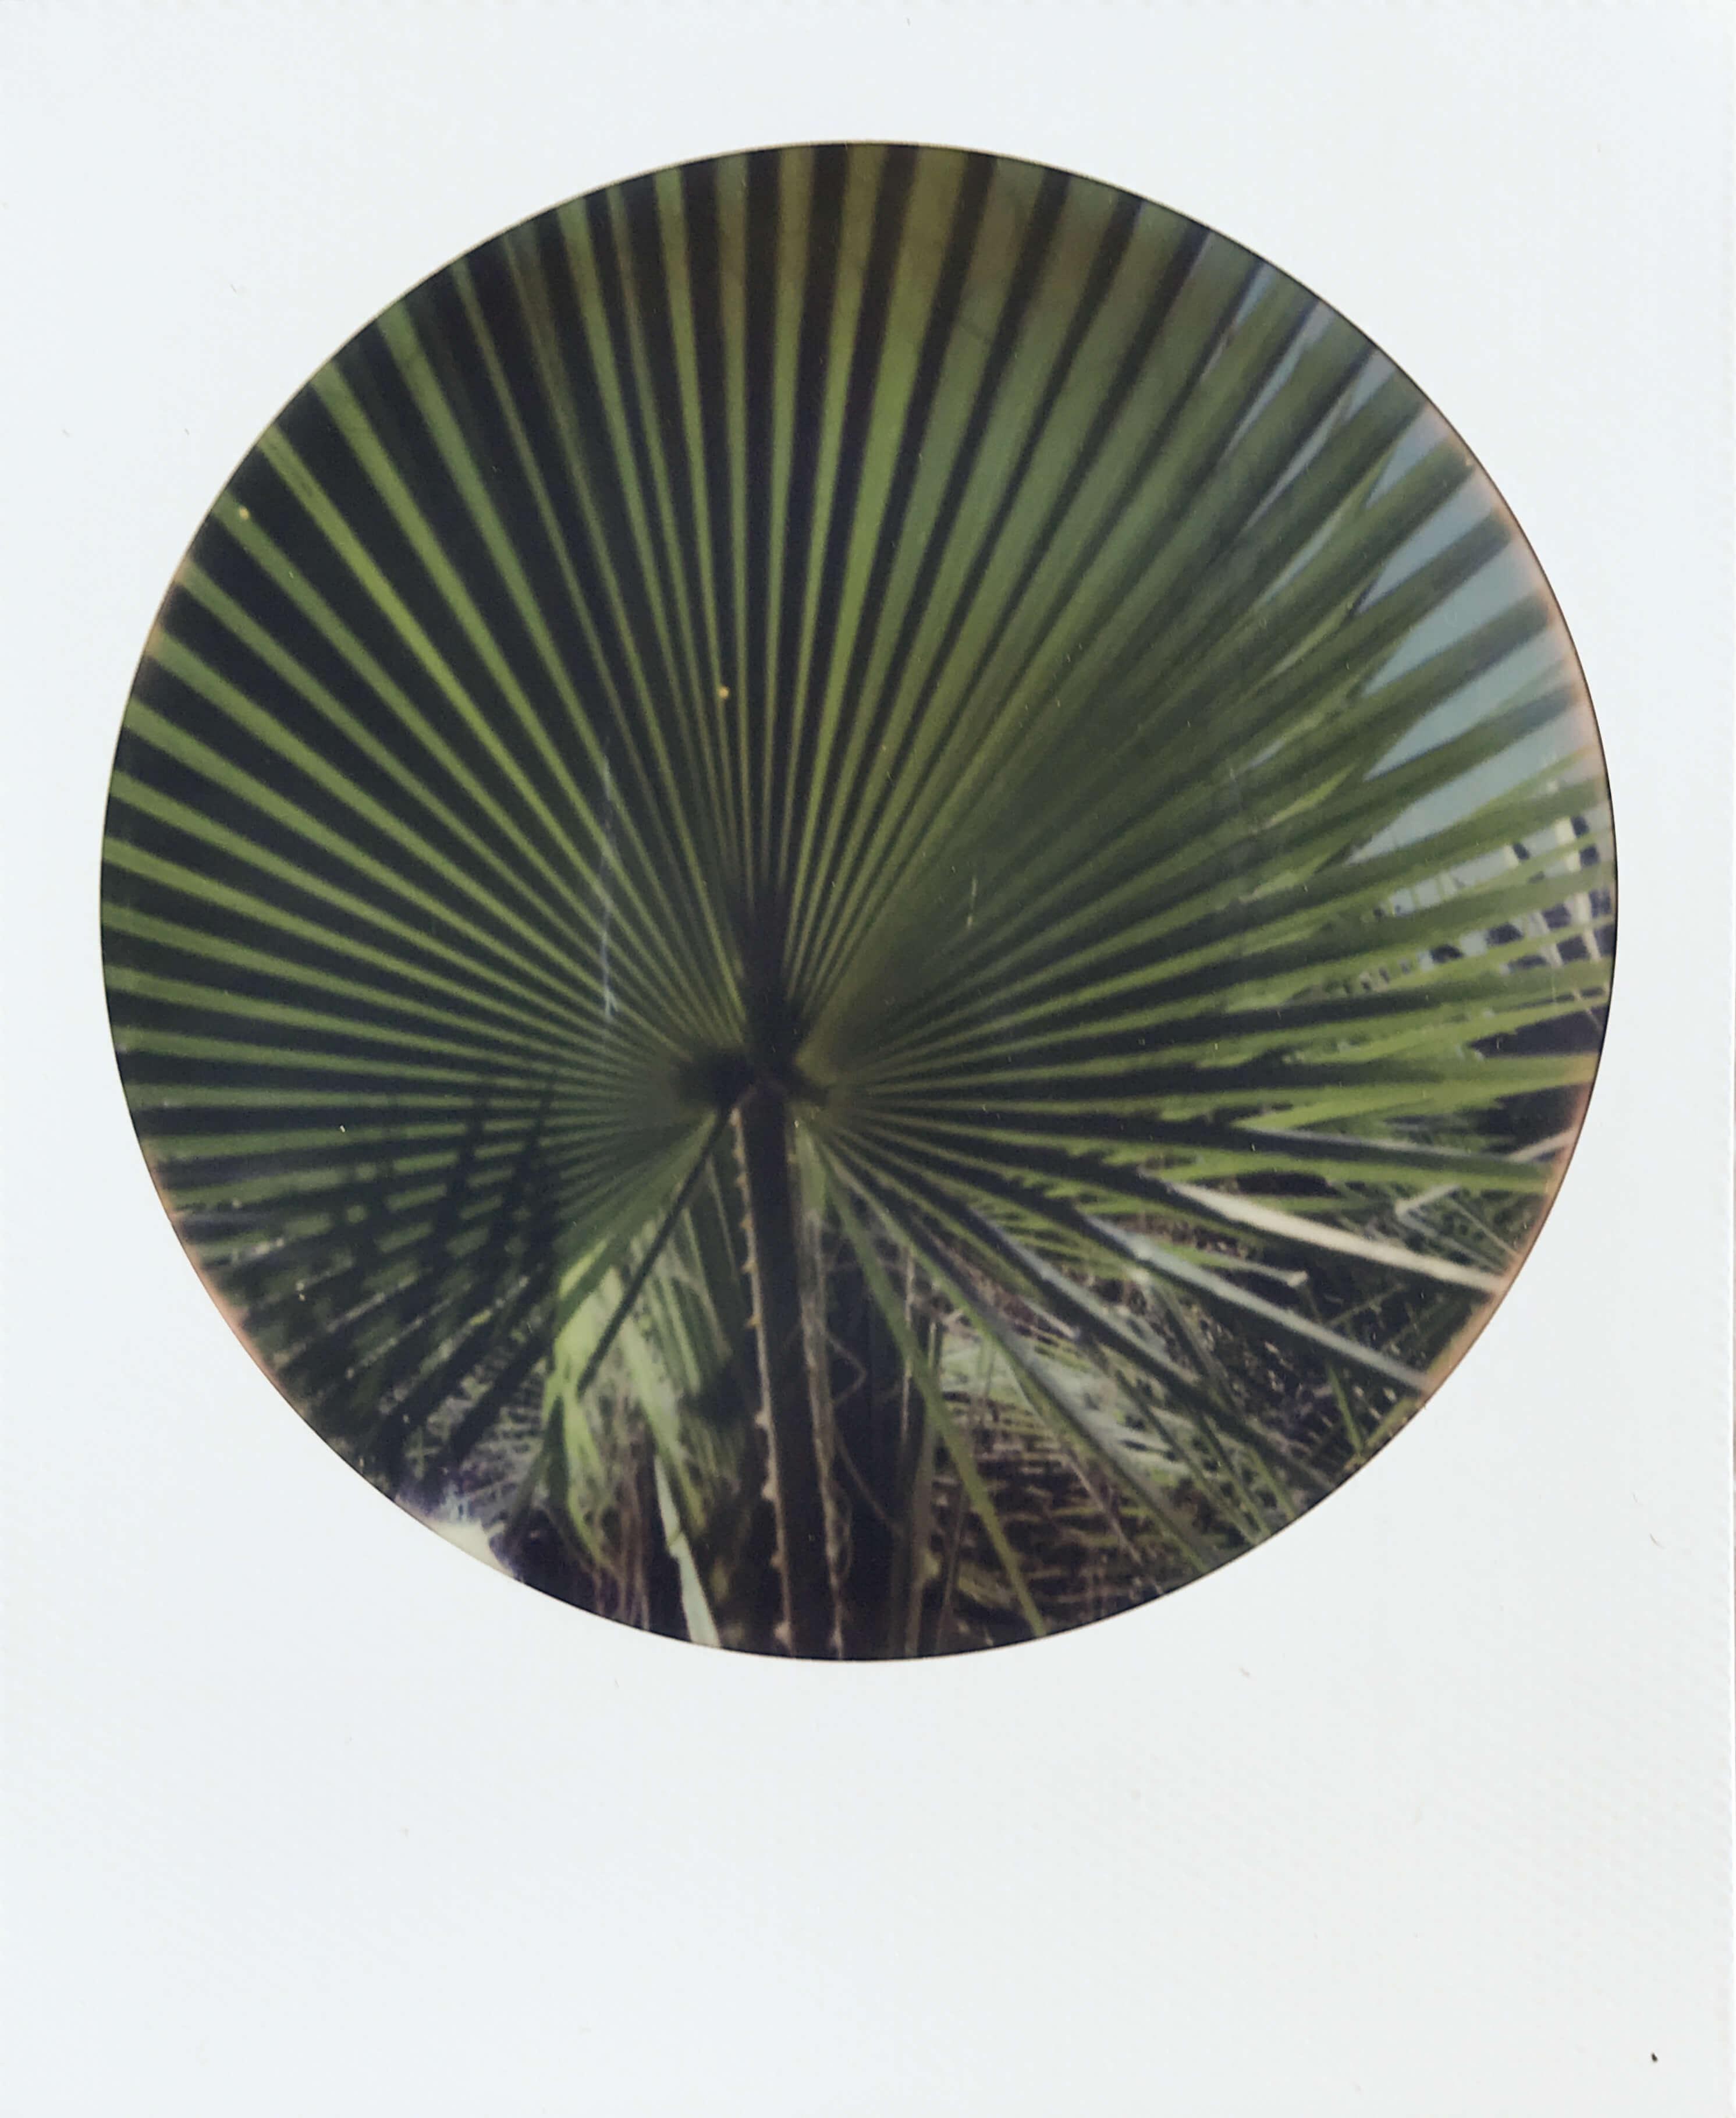 Polaroid of a palm